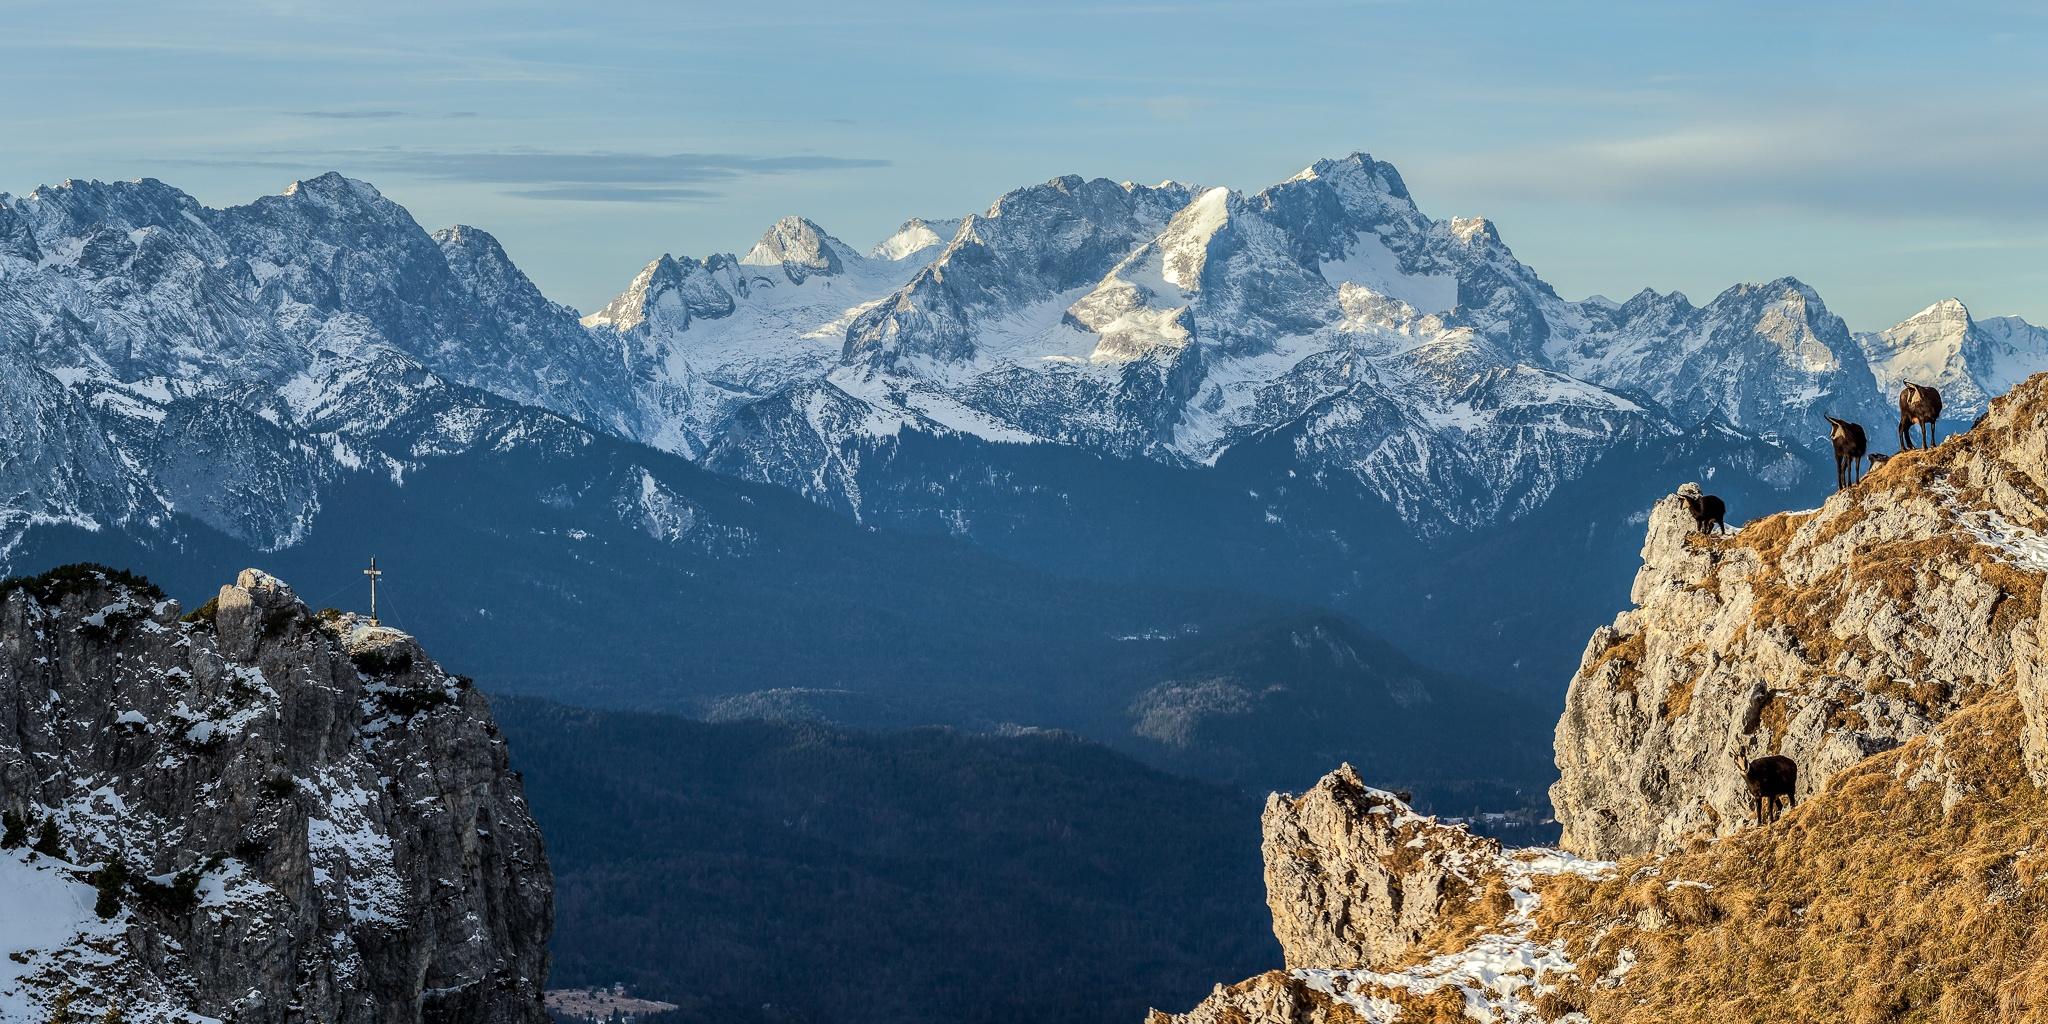 Karwendel, Soierngruppe, Panorama, Wettersteinblick, Bergpanorama, Gemsen